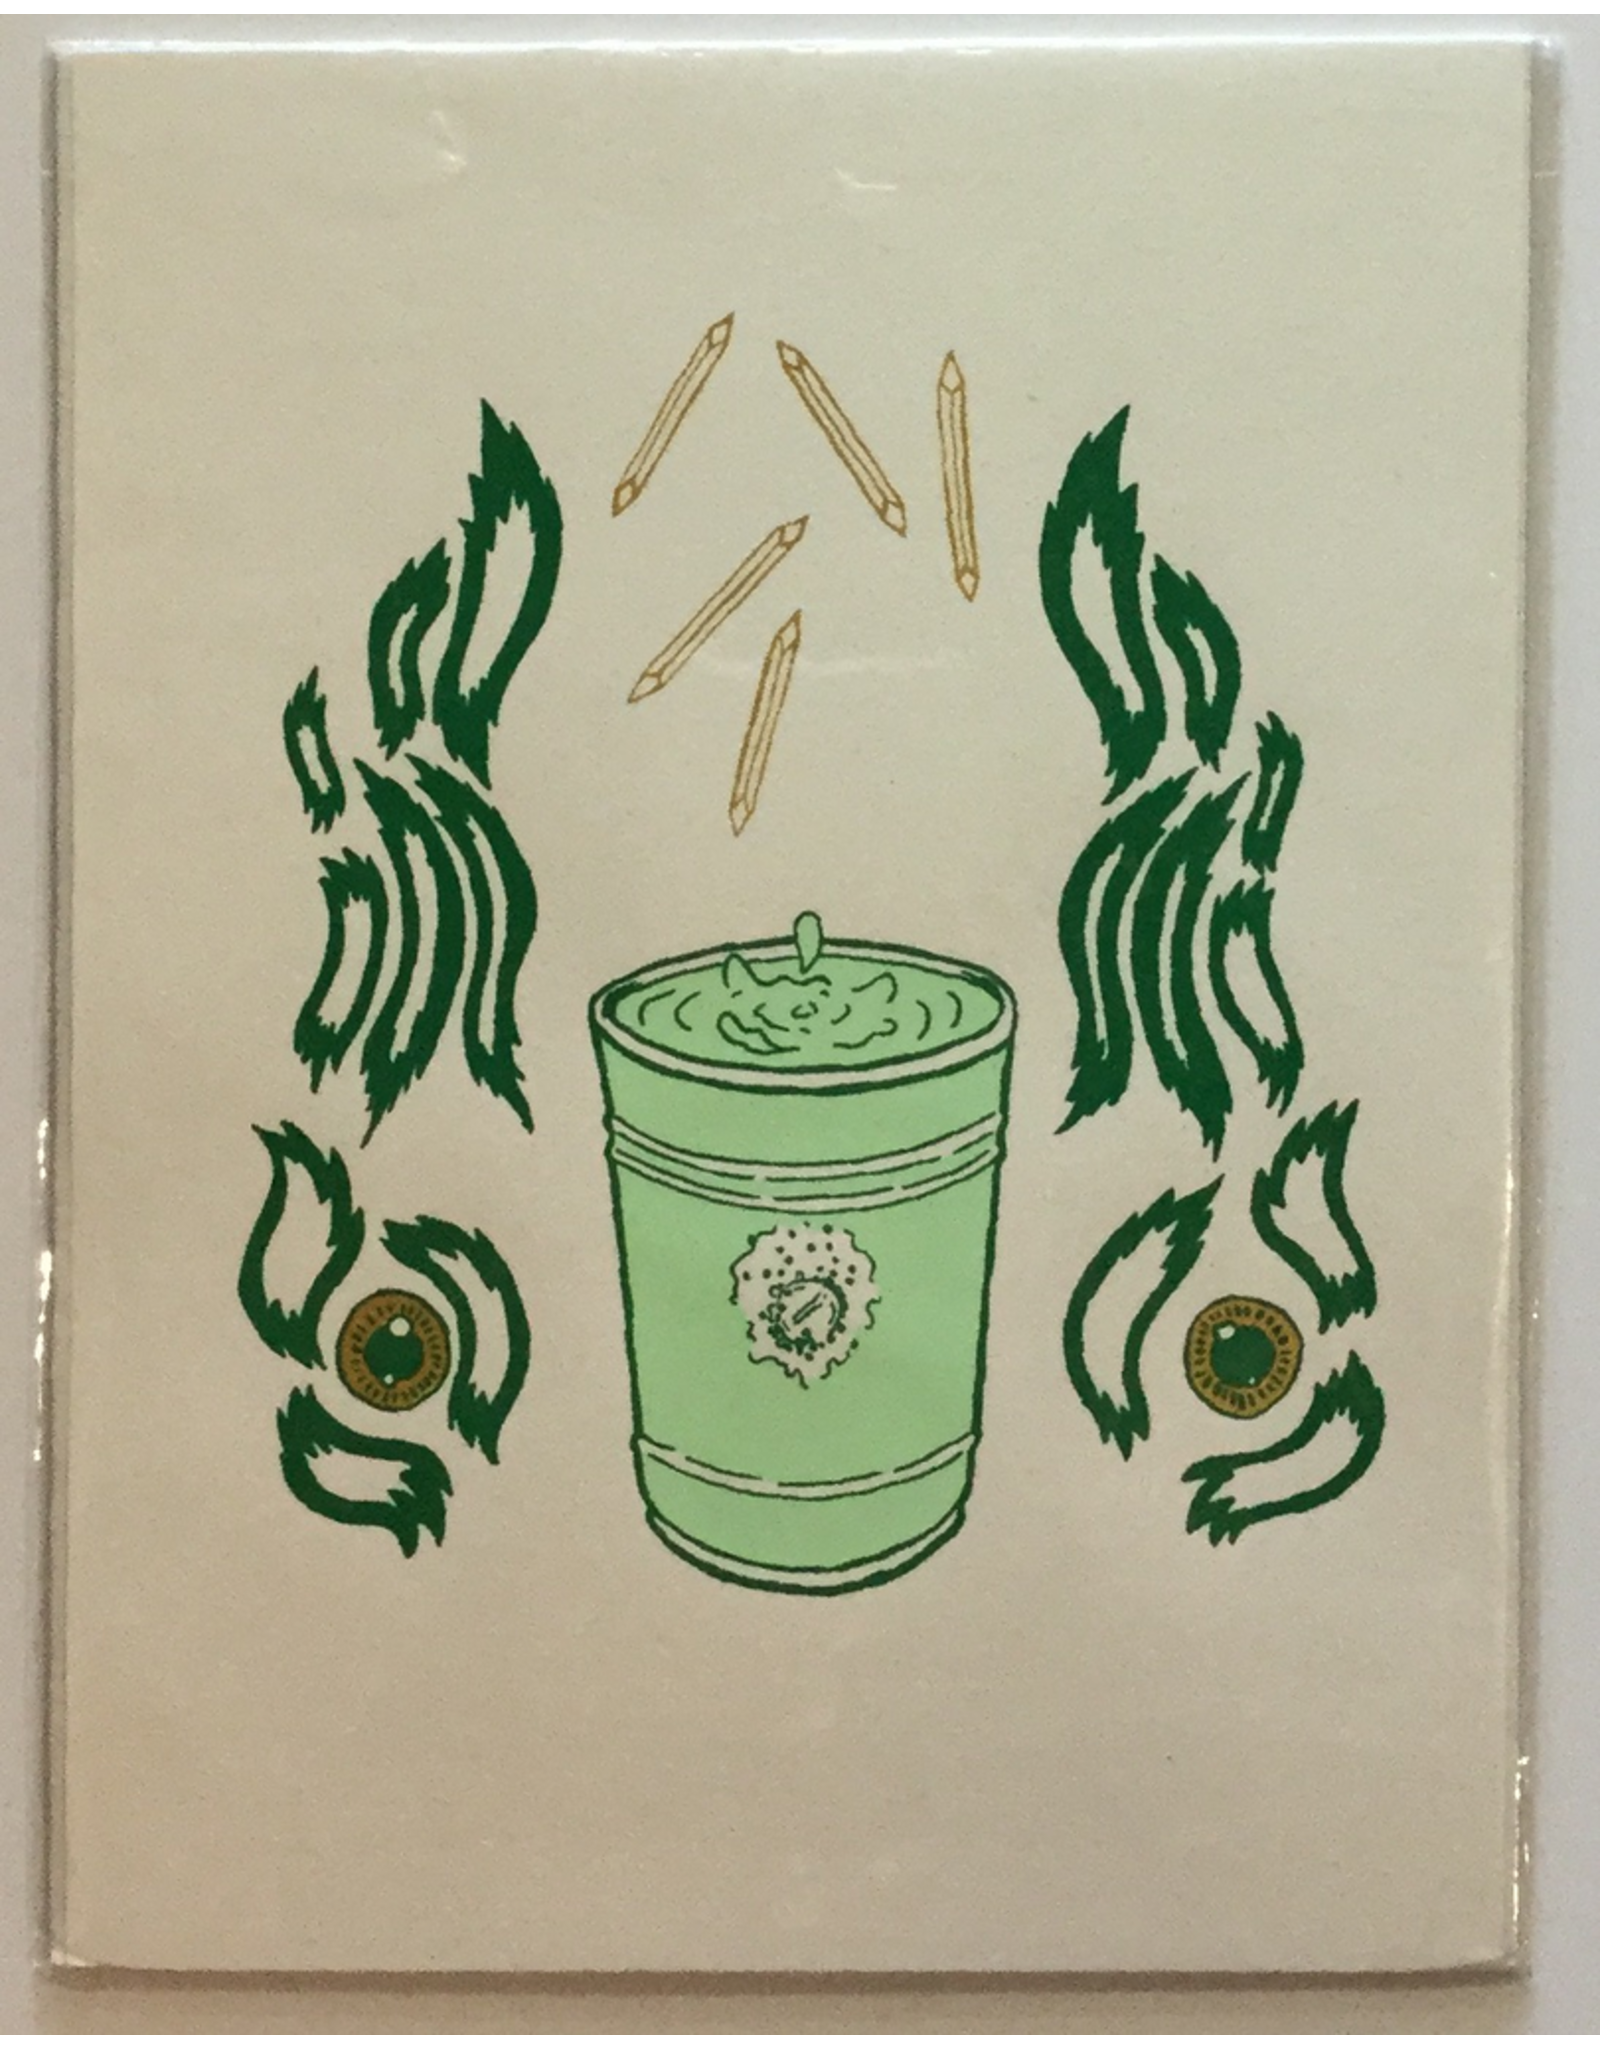 Mayer, Emma Roofies, Print